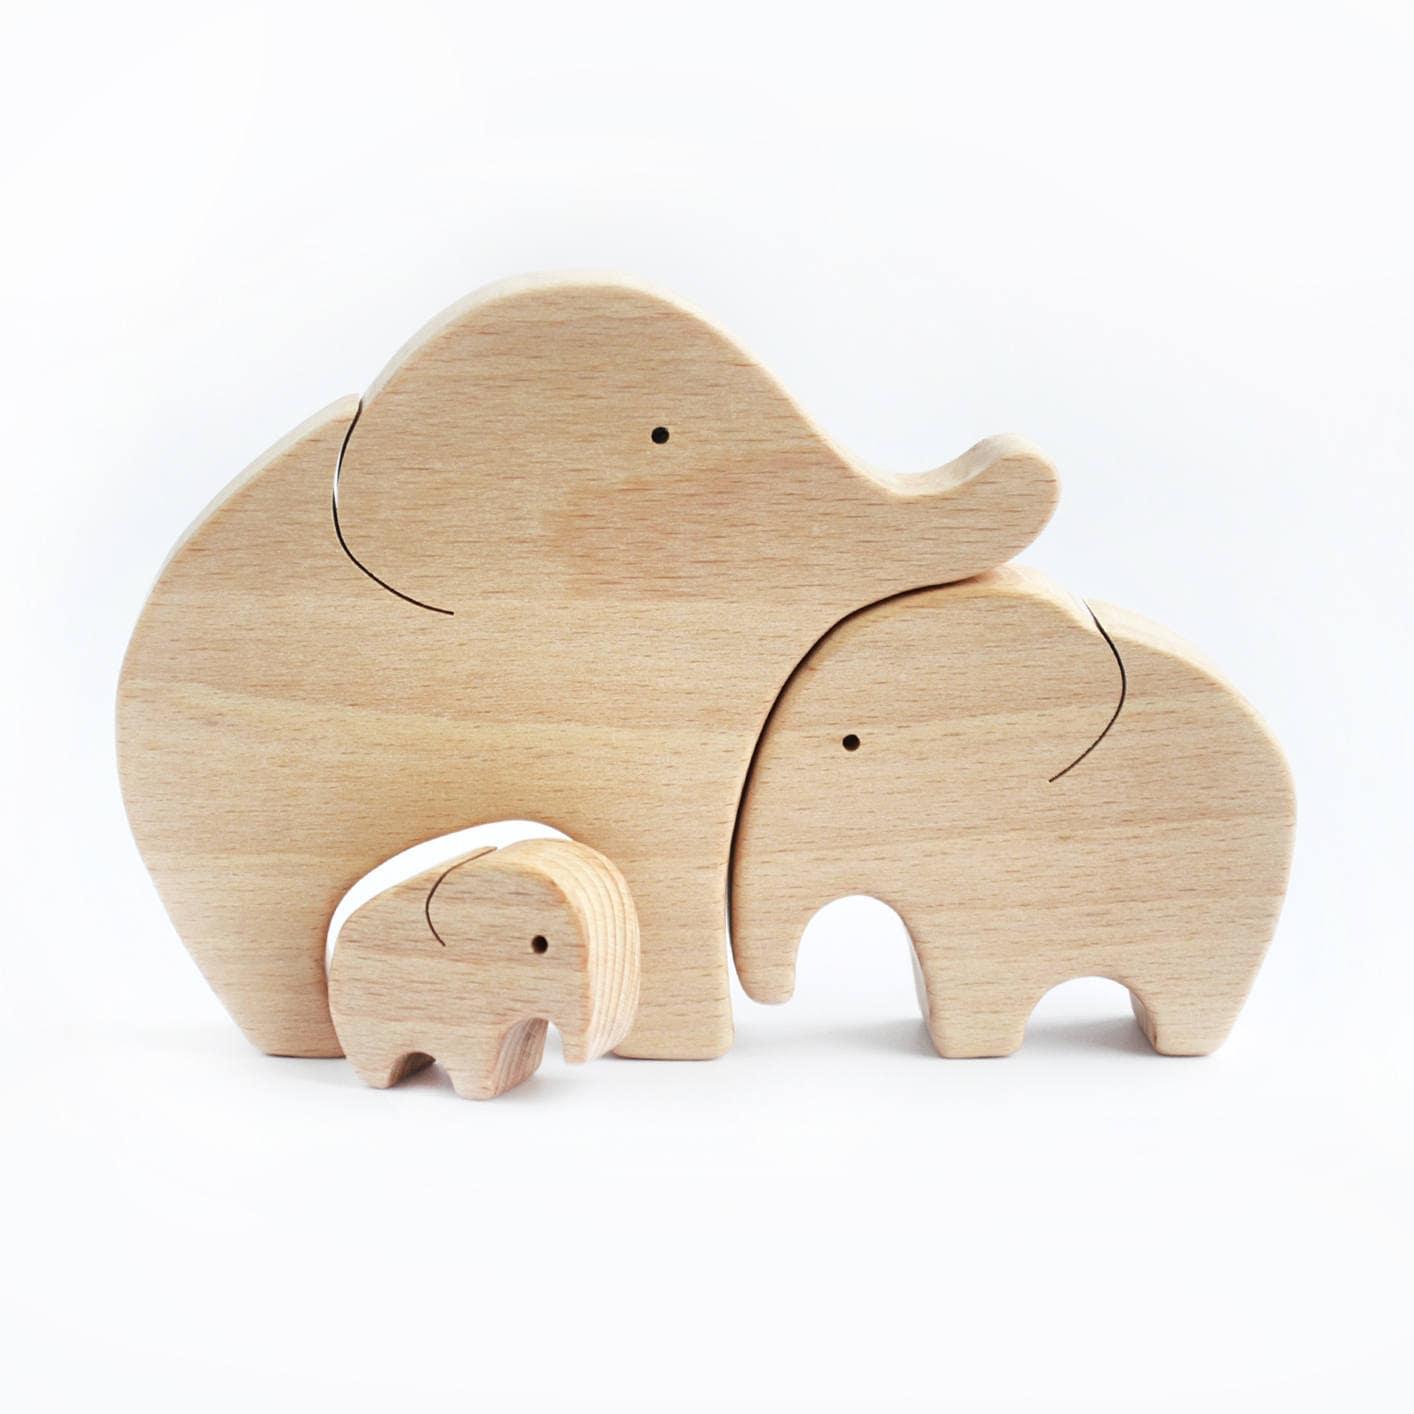 Holz Elefant Rätsel Kinderzimmer Dekor Elefant Spielzeug